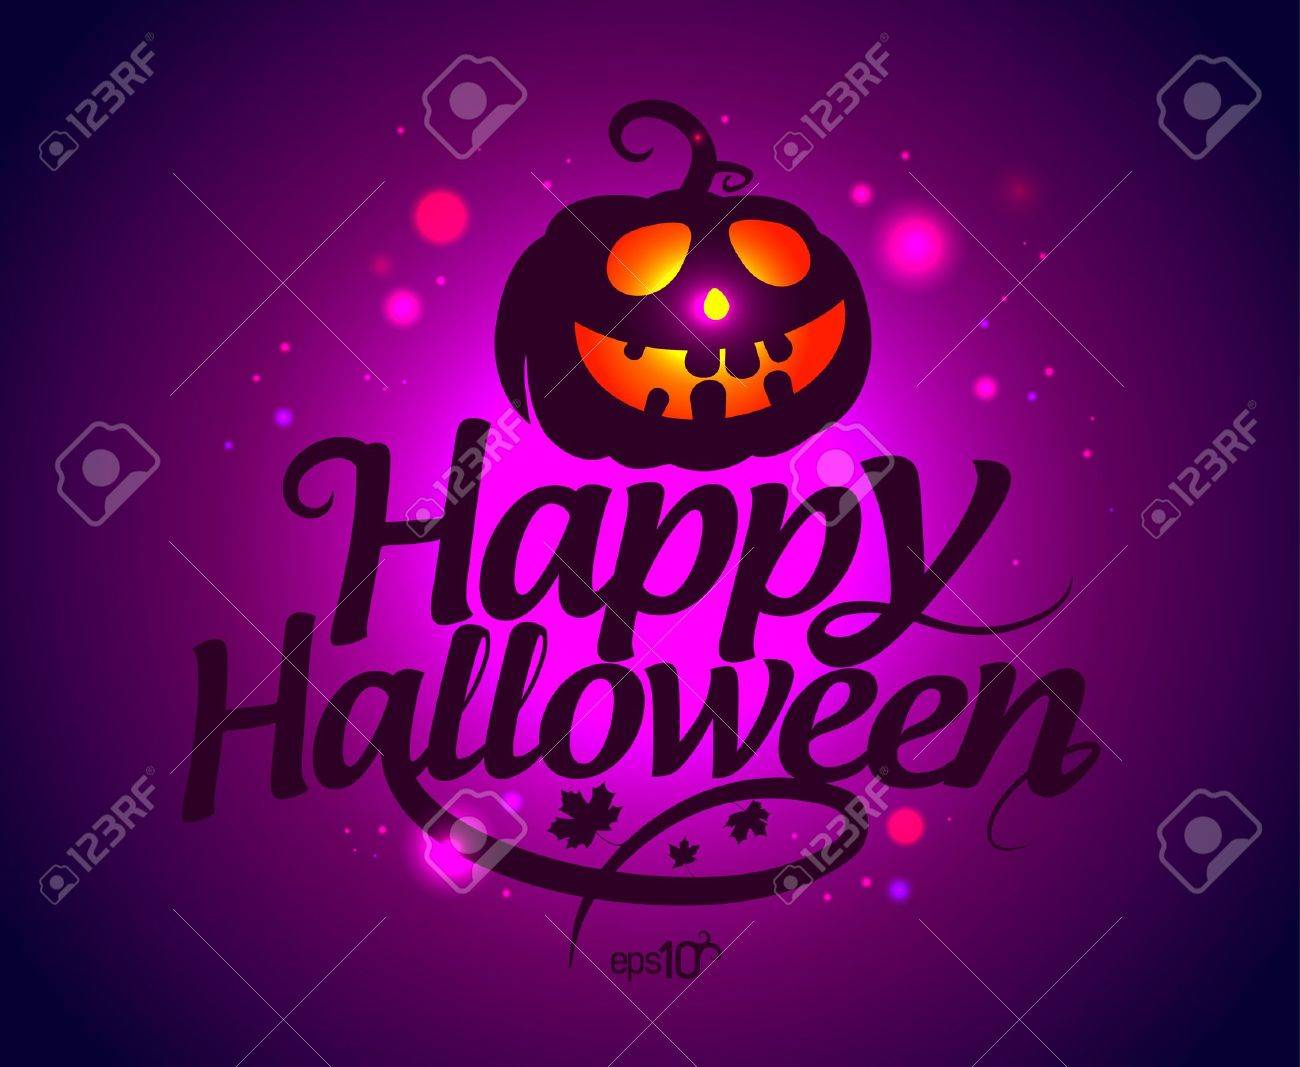 happy halloween card with pumpkin royalty free cliparts vectors